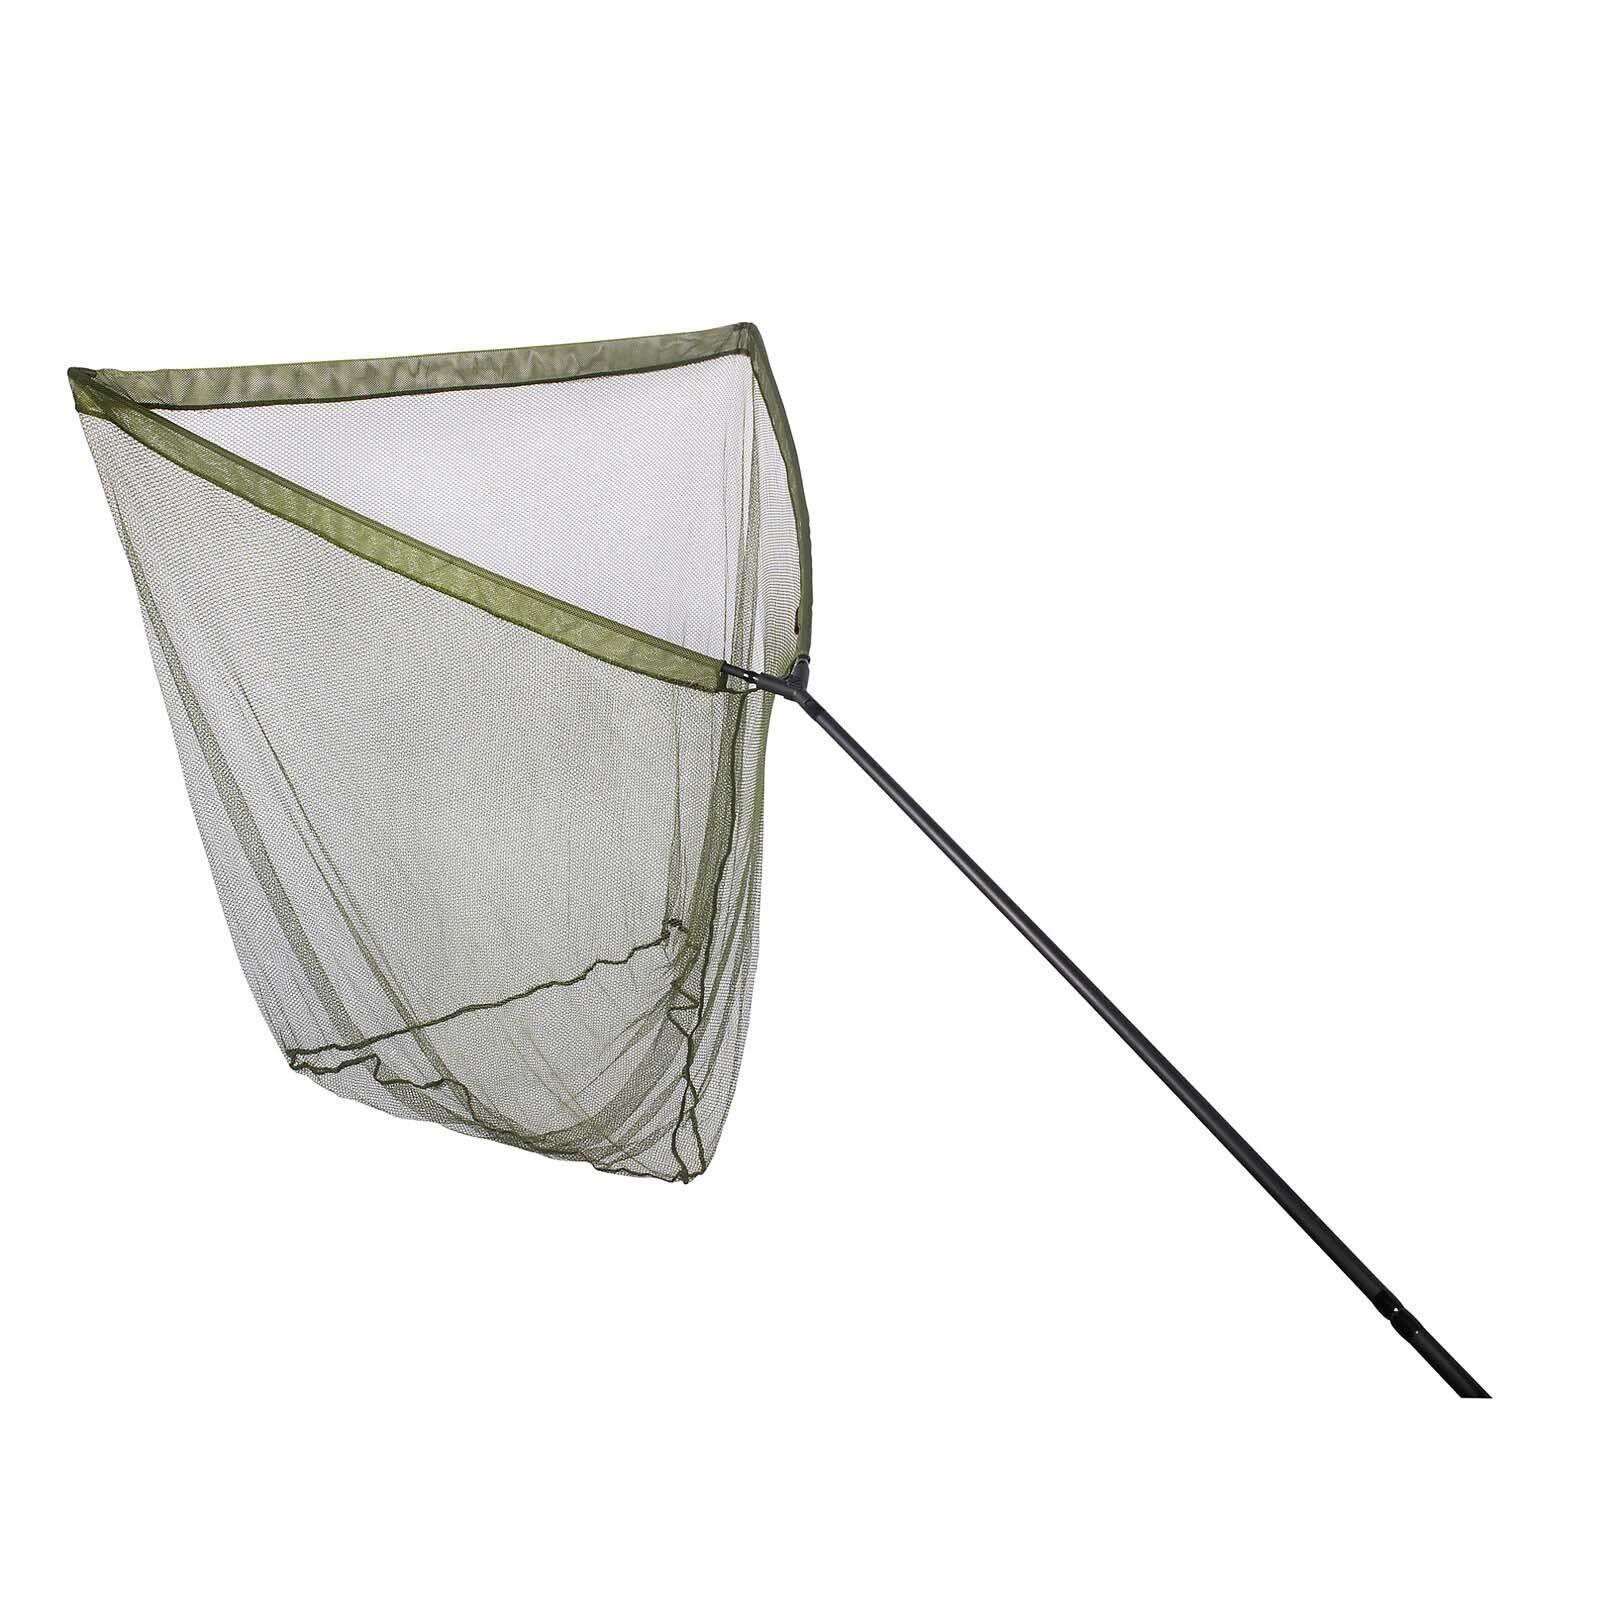 JRC Carp Fishing X-Lite &  X-Lite Pro 42 Inch Landing Nets - Compact, Lightweight  the most fashionable